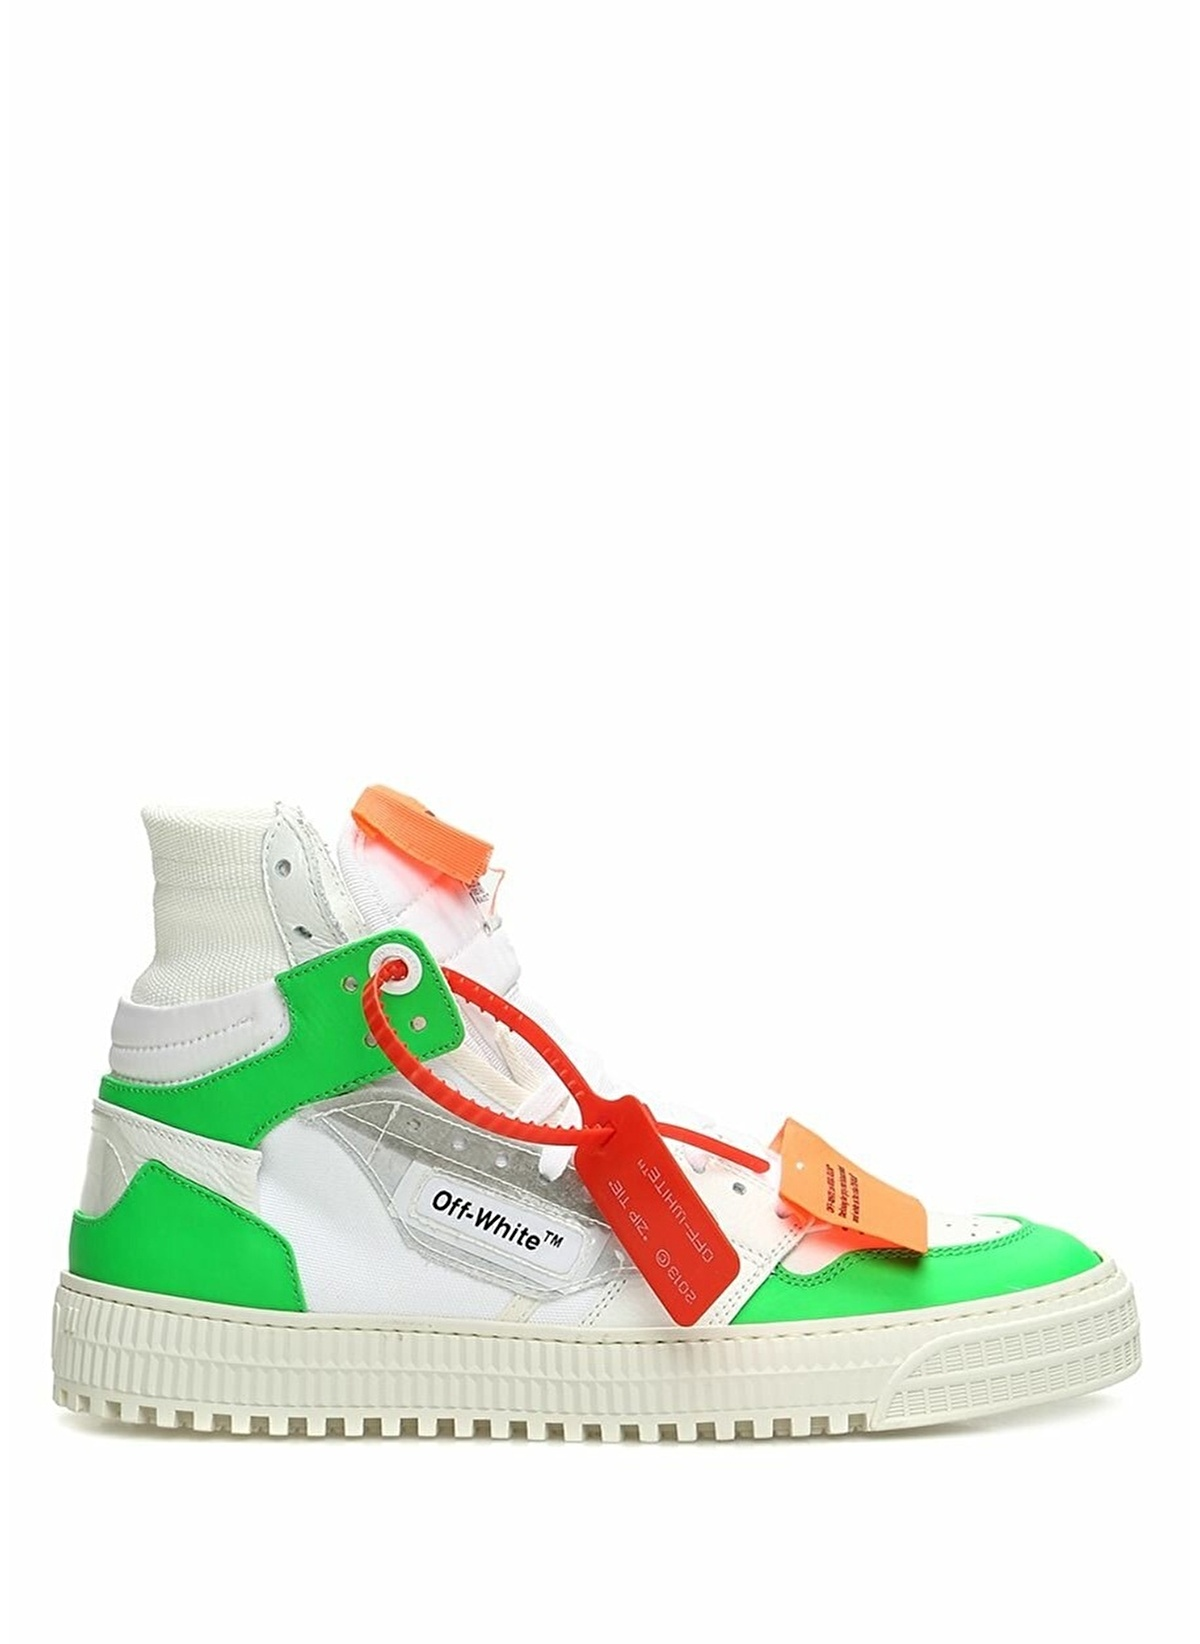 Off-white Sneakers 101380544 K Sneakers – 4099.0 TL